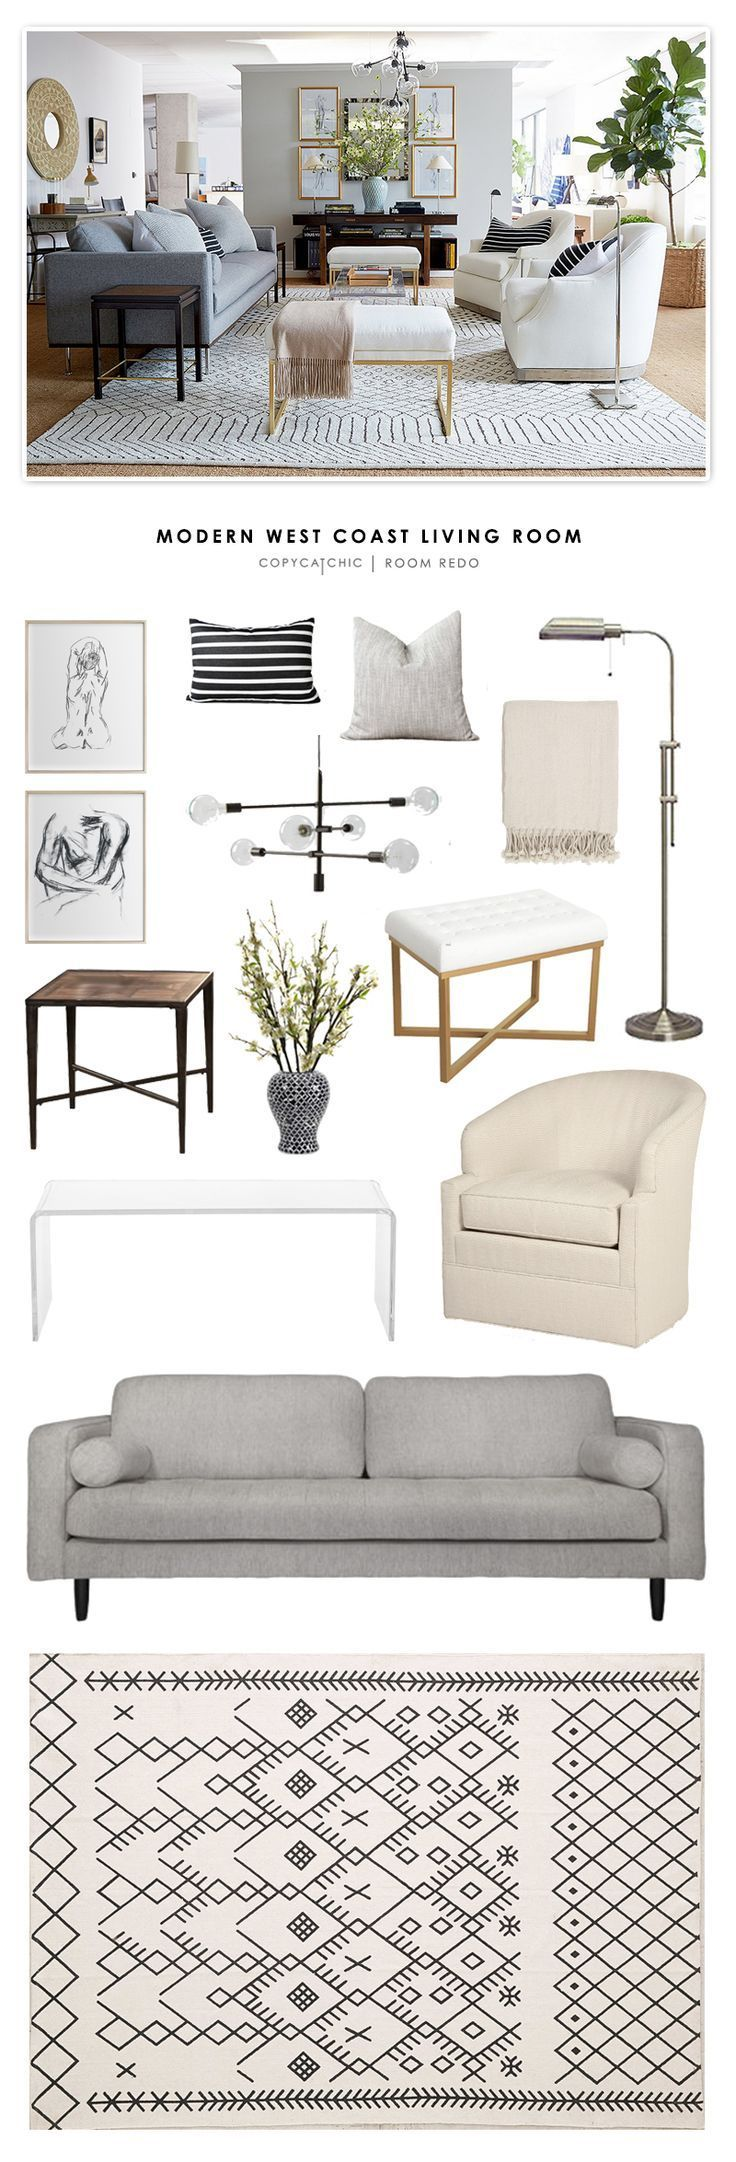 Best 25 living room redo ideas on pinterest basement for How to redo your room for cheap